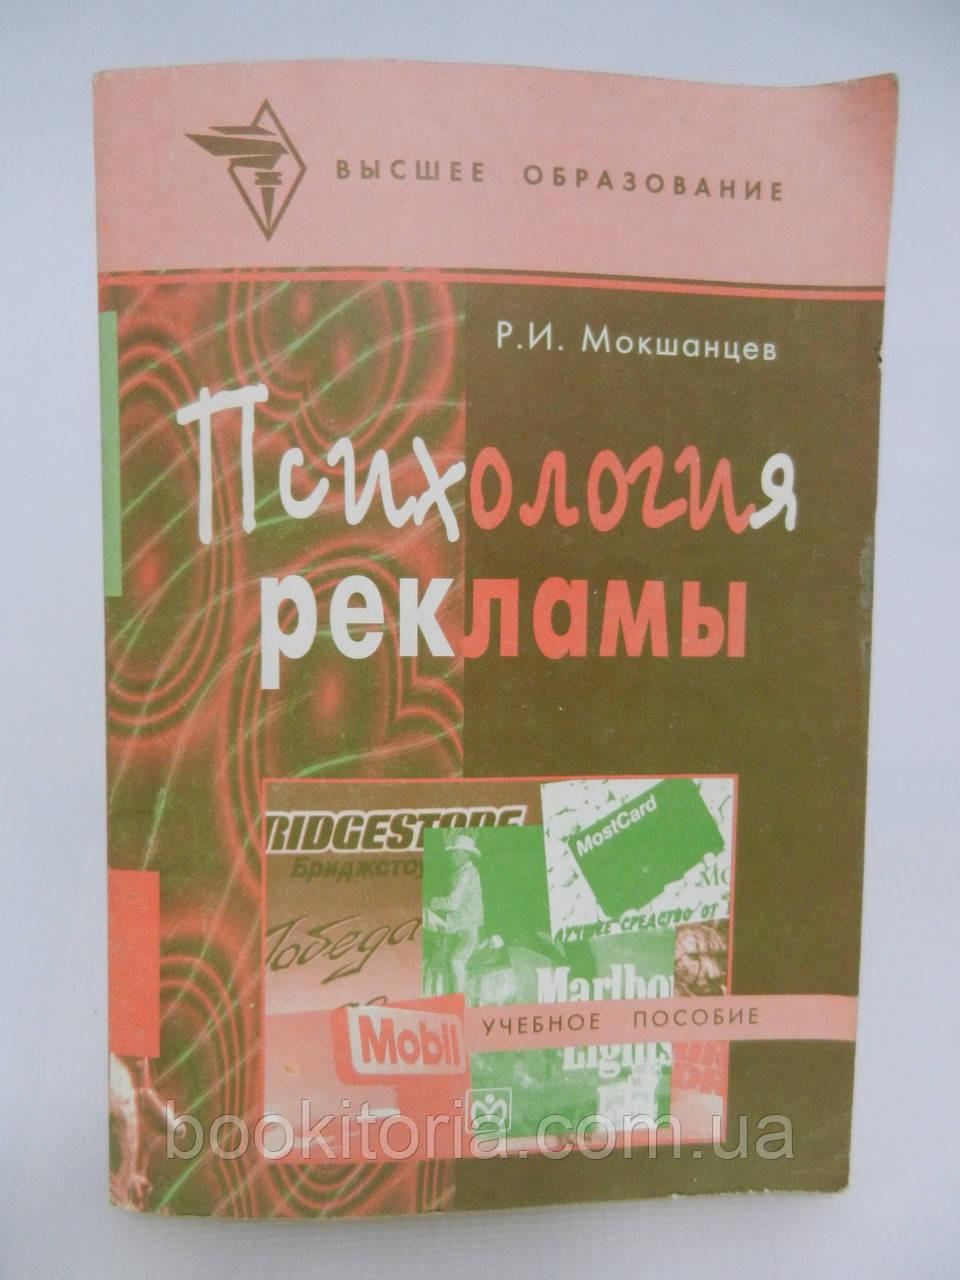 Мокшанцев Р.О. Психология рекламы (б/у).